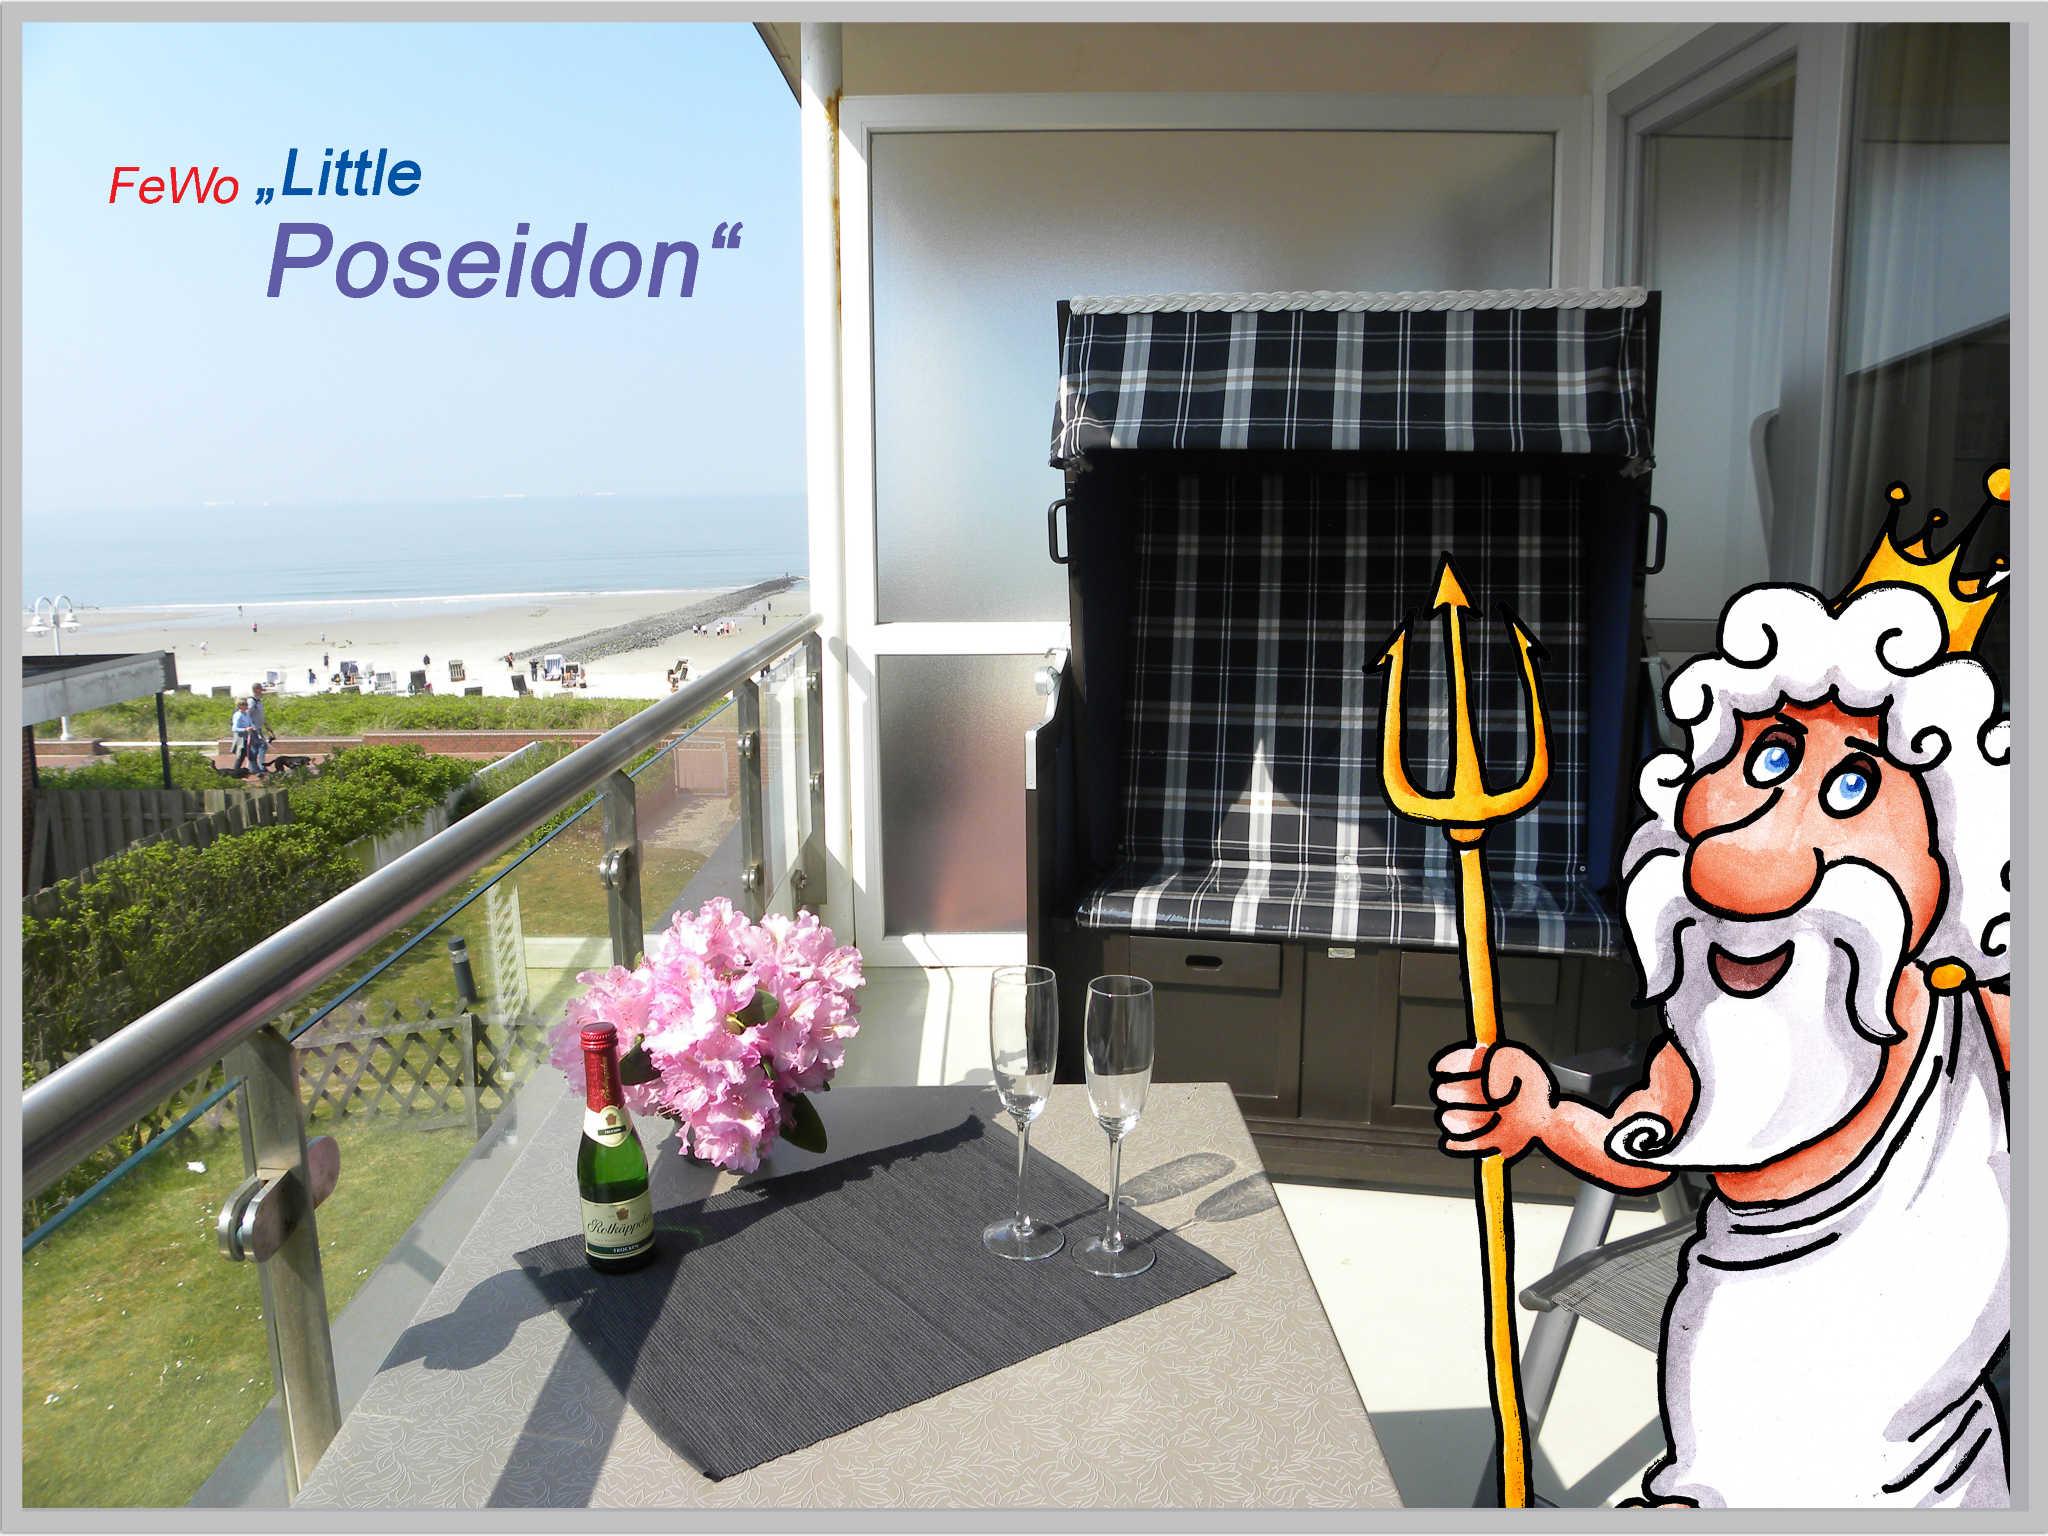 Ferienwohnung Little Poseidon